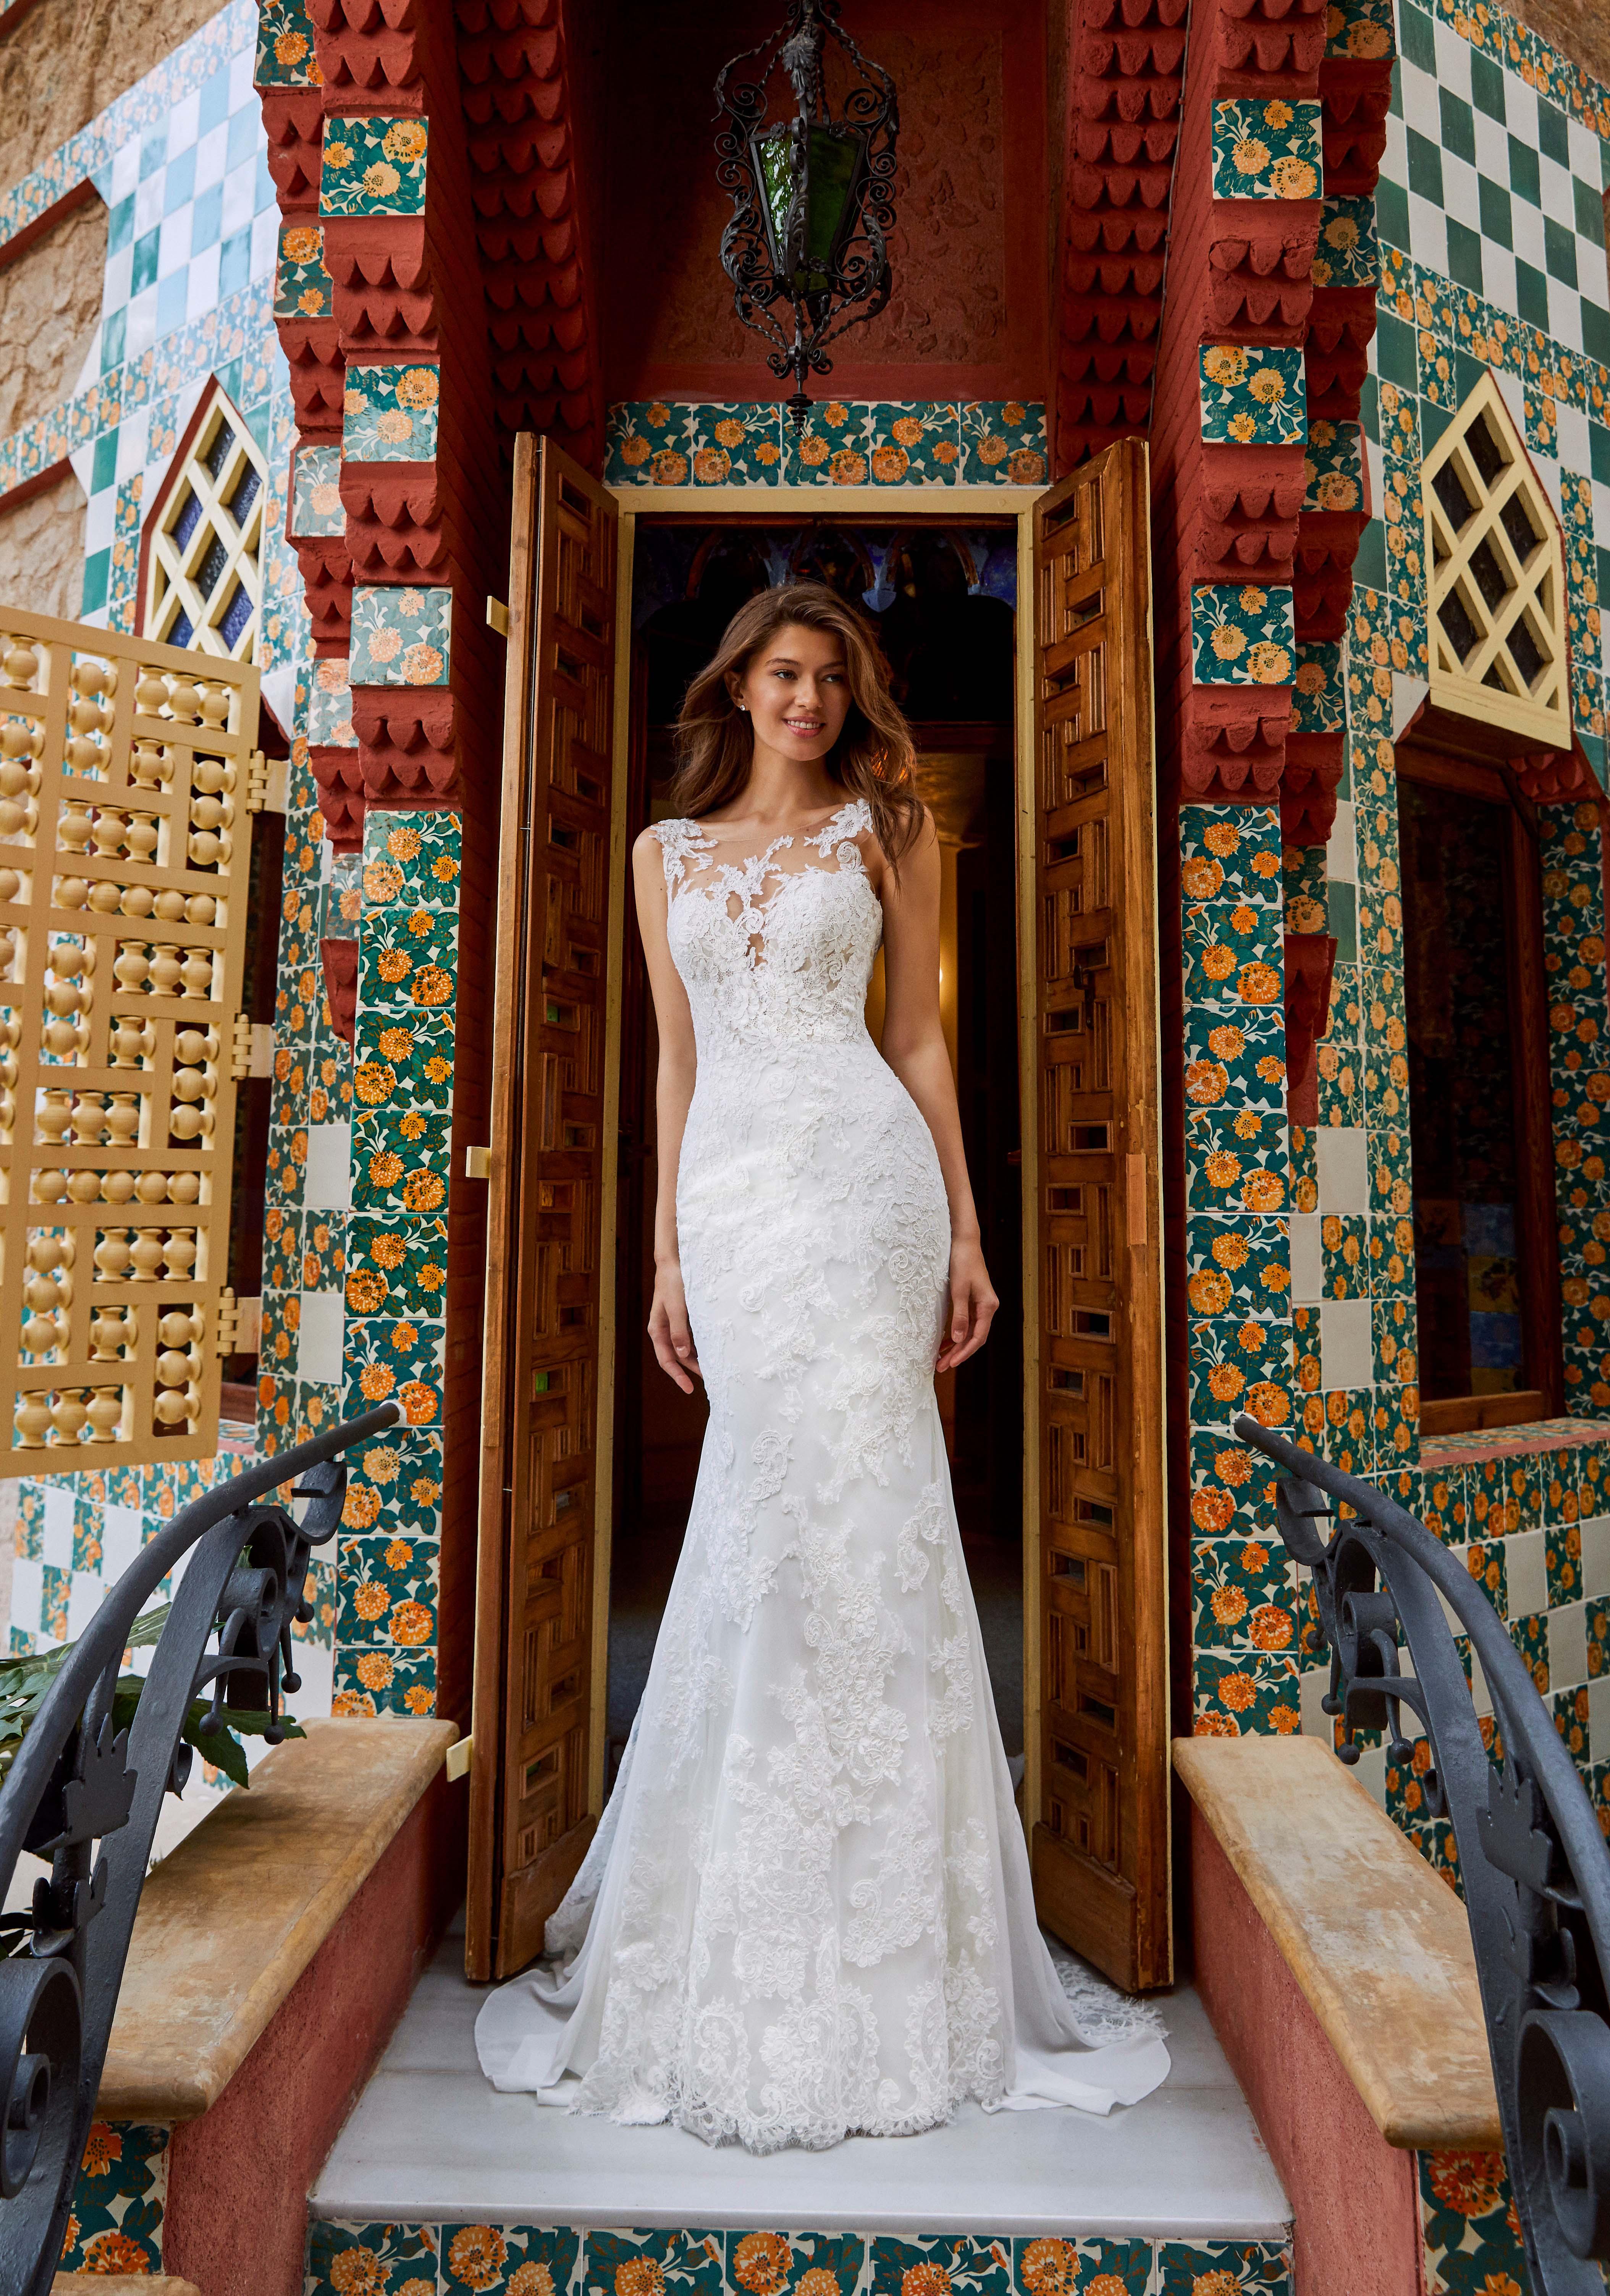 pronovias kleinfeld wedding dress fall 2019 05